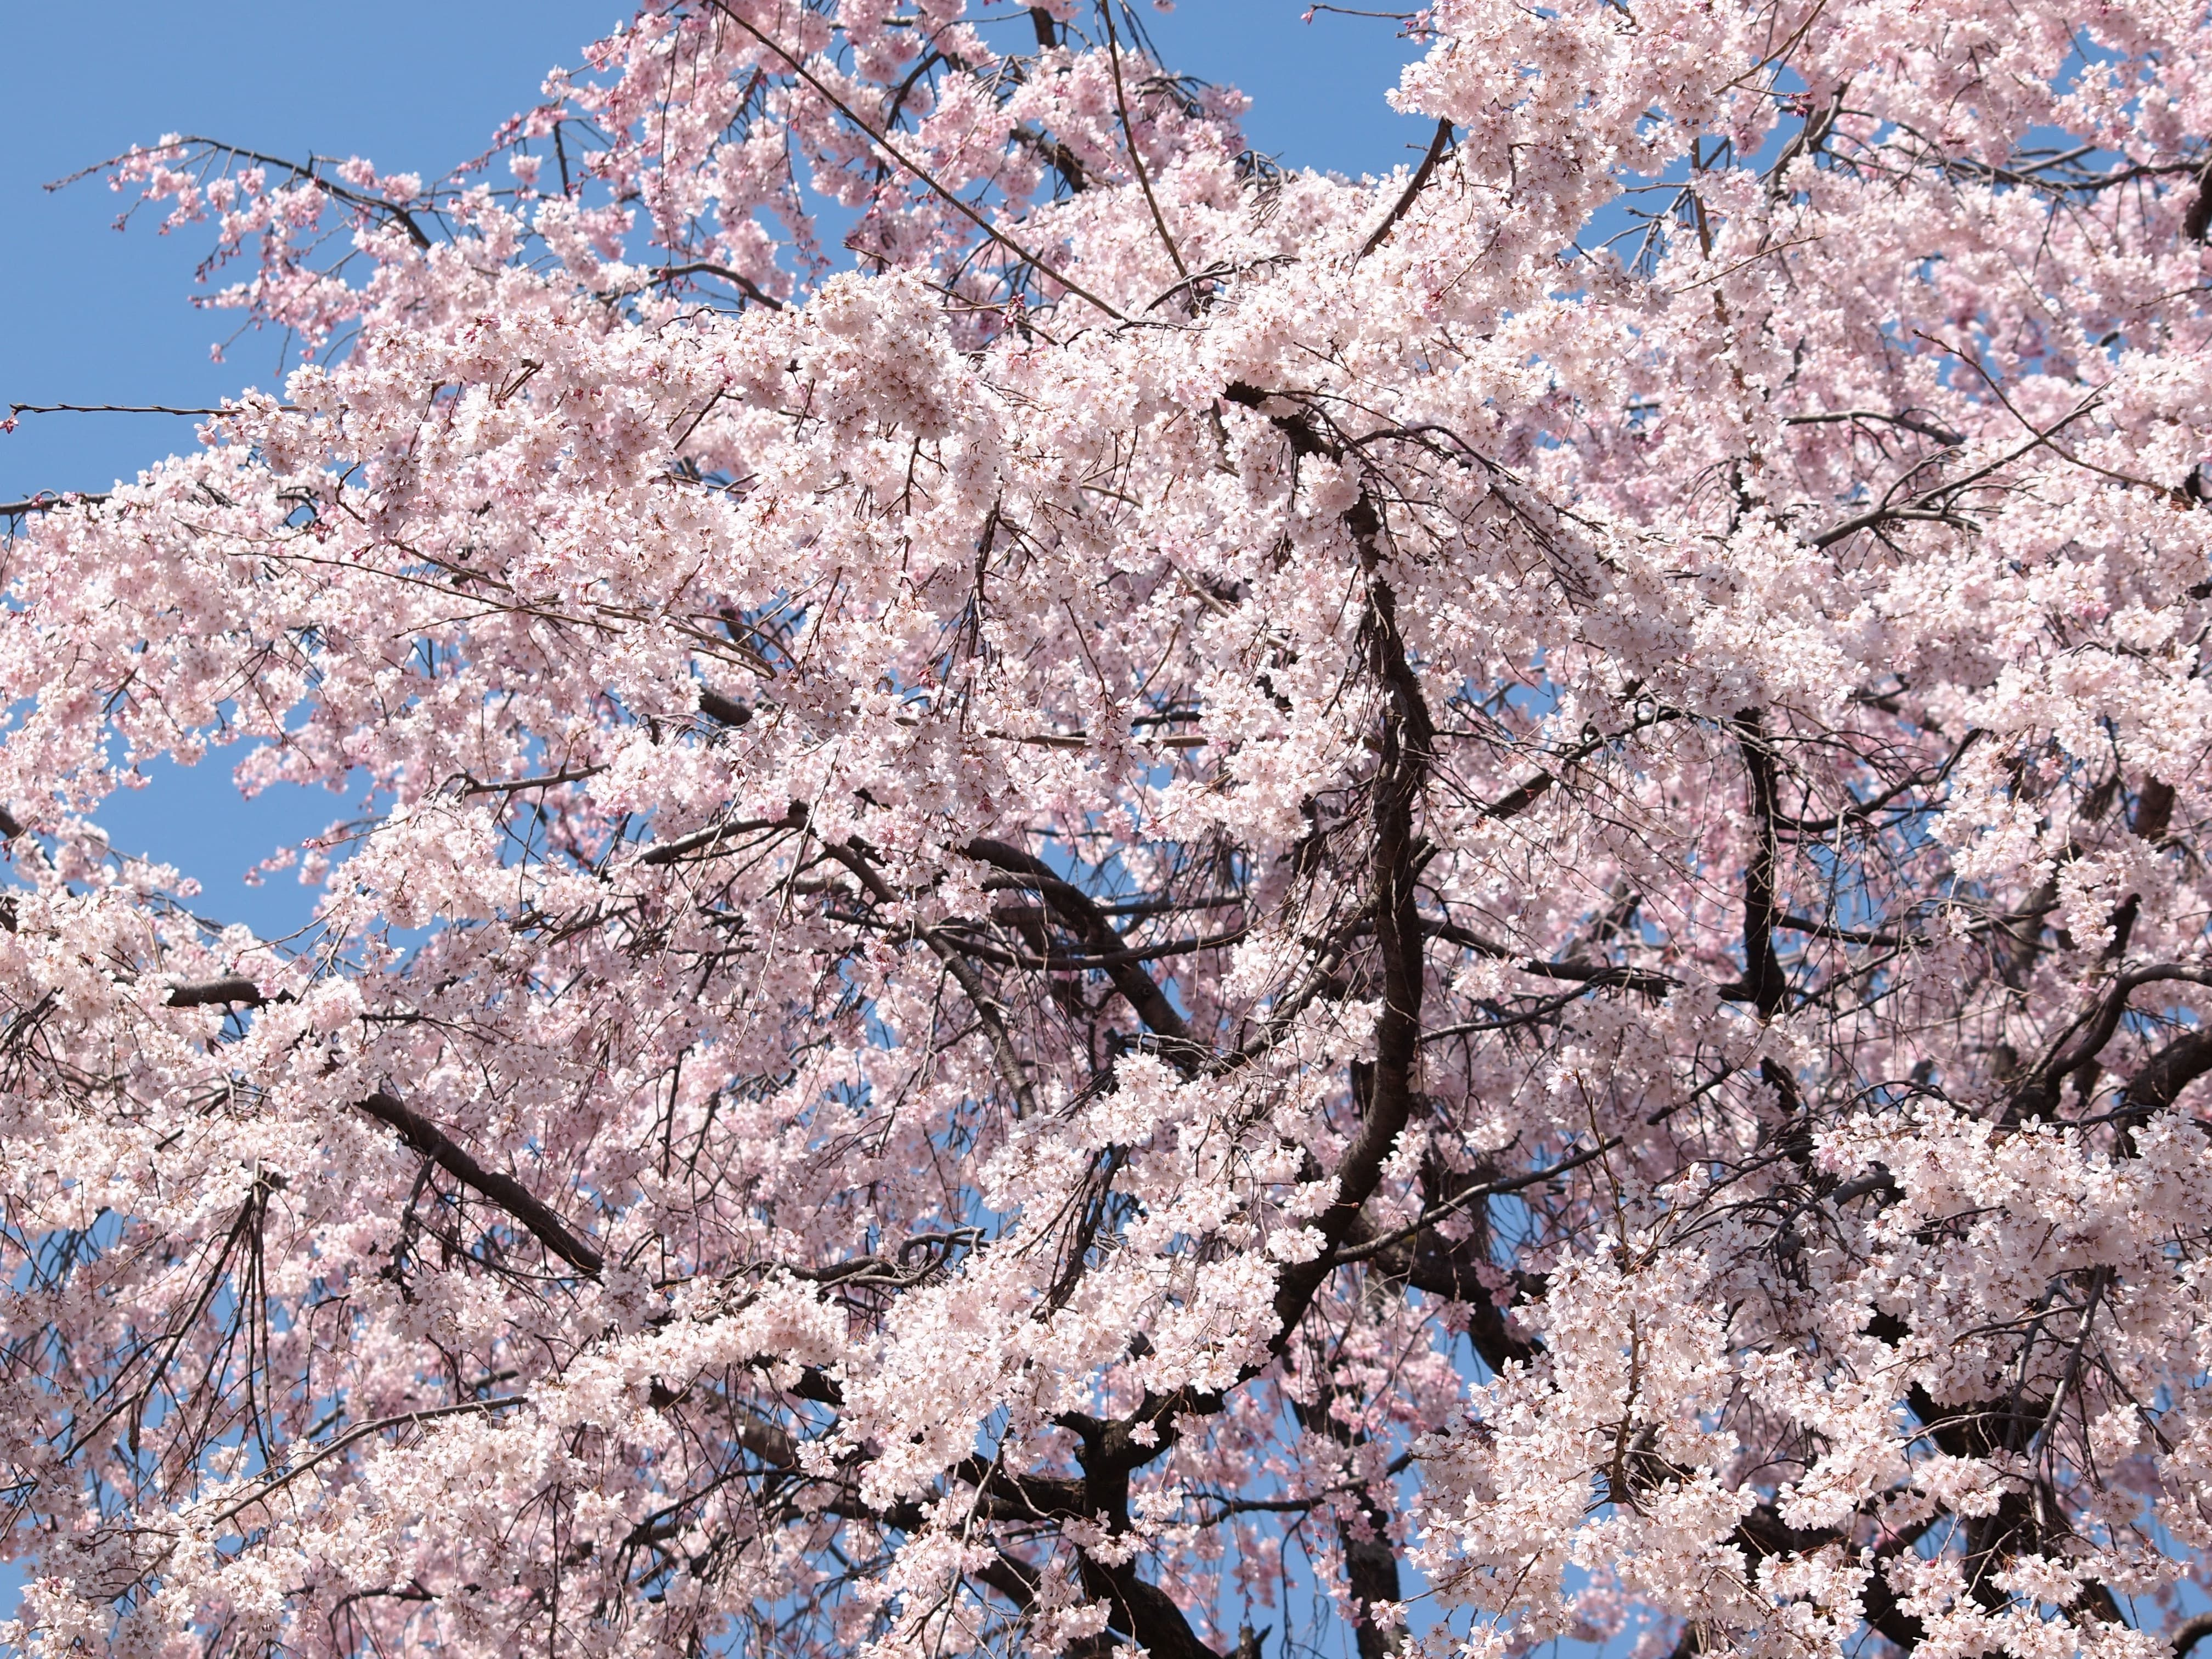 Tips For The National Cherry Blossom Festival In Washington D C Cherry Blossom Festival Cherry Blossom Washington Dc Travel